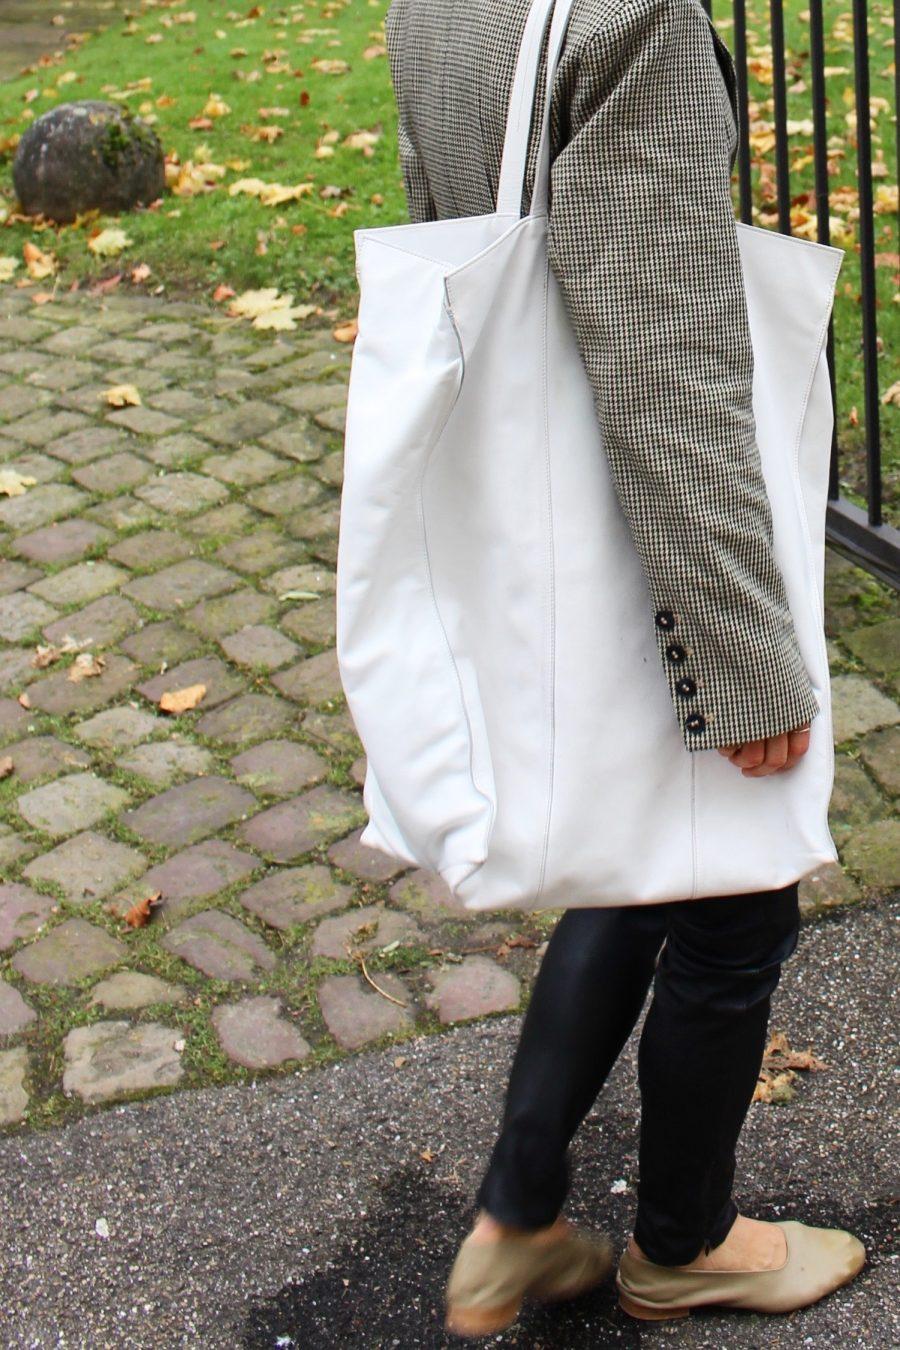 H&M Trend Blazer 2017 Balenciaga style